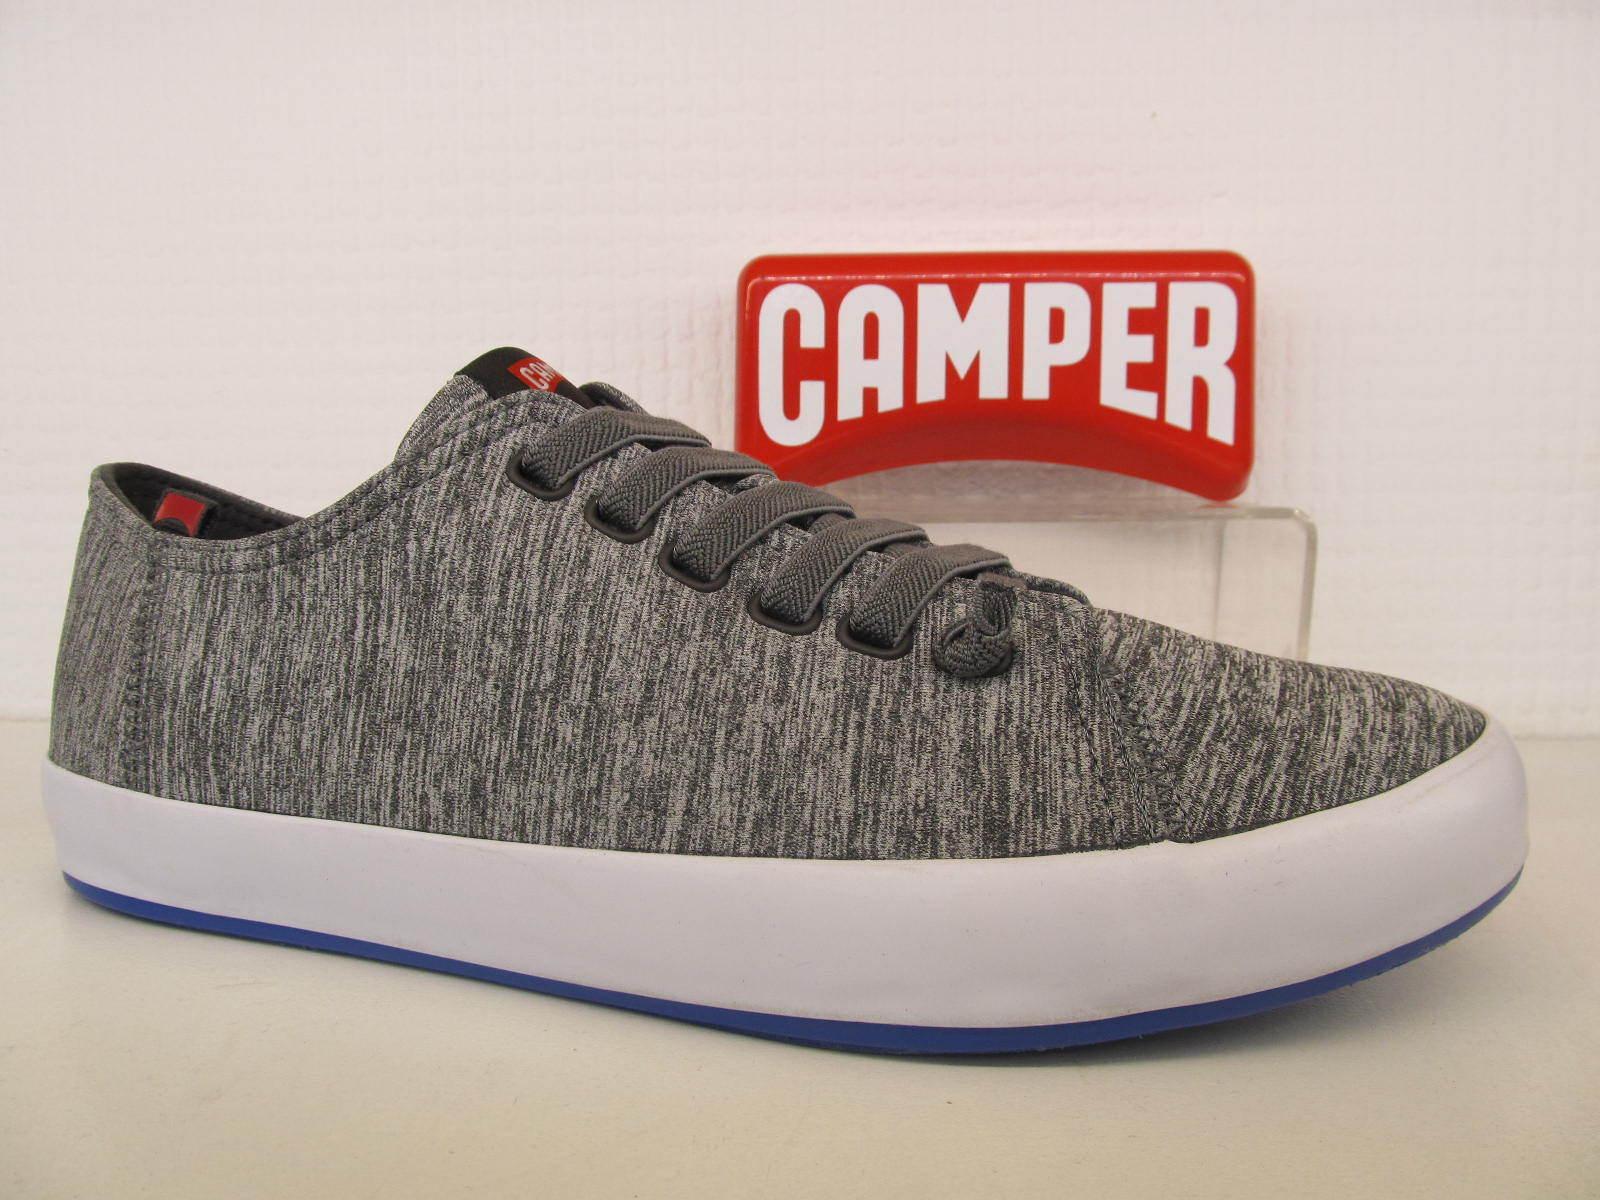 Camper Textile Andratx K100158 - 004 Light Gris Textile Camper Elastic Hombre Trainer zapatos c2e861